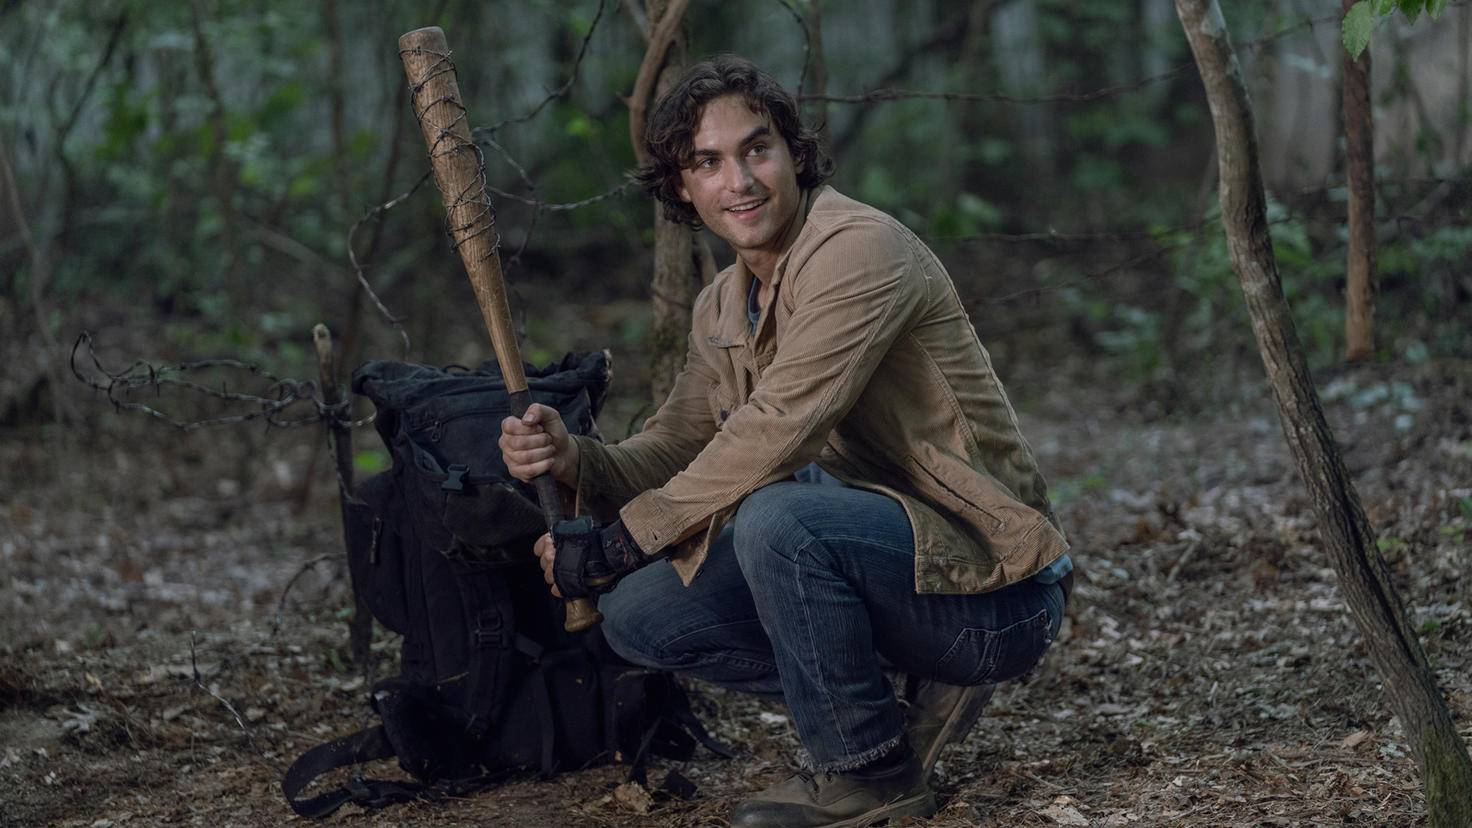 The Walking Dead-S10E05-Brandon-Jace Downs-AMC-2